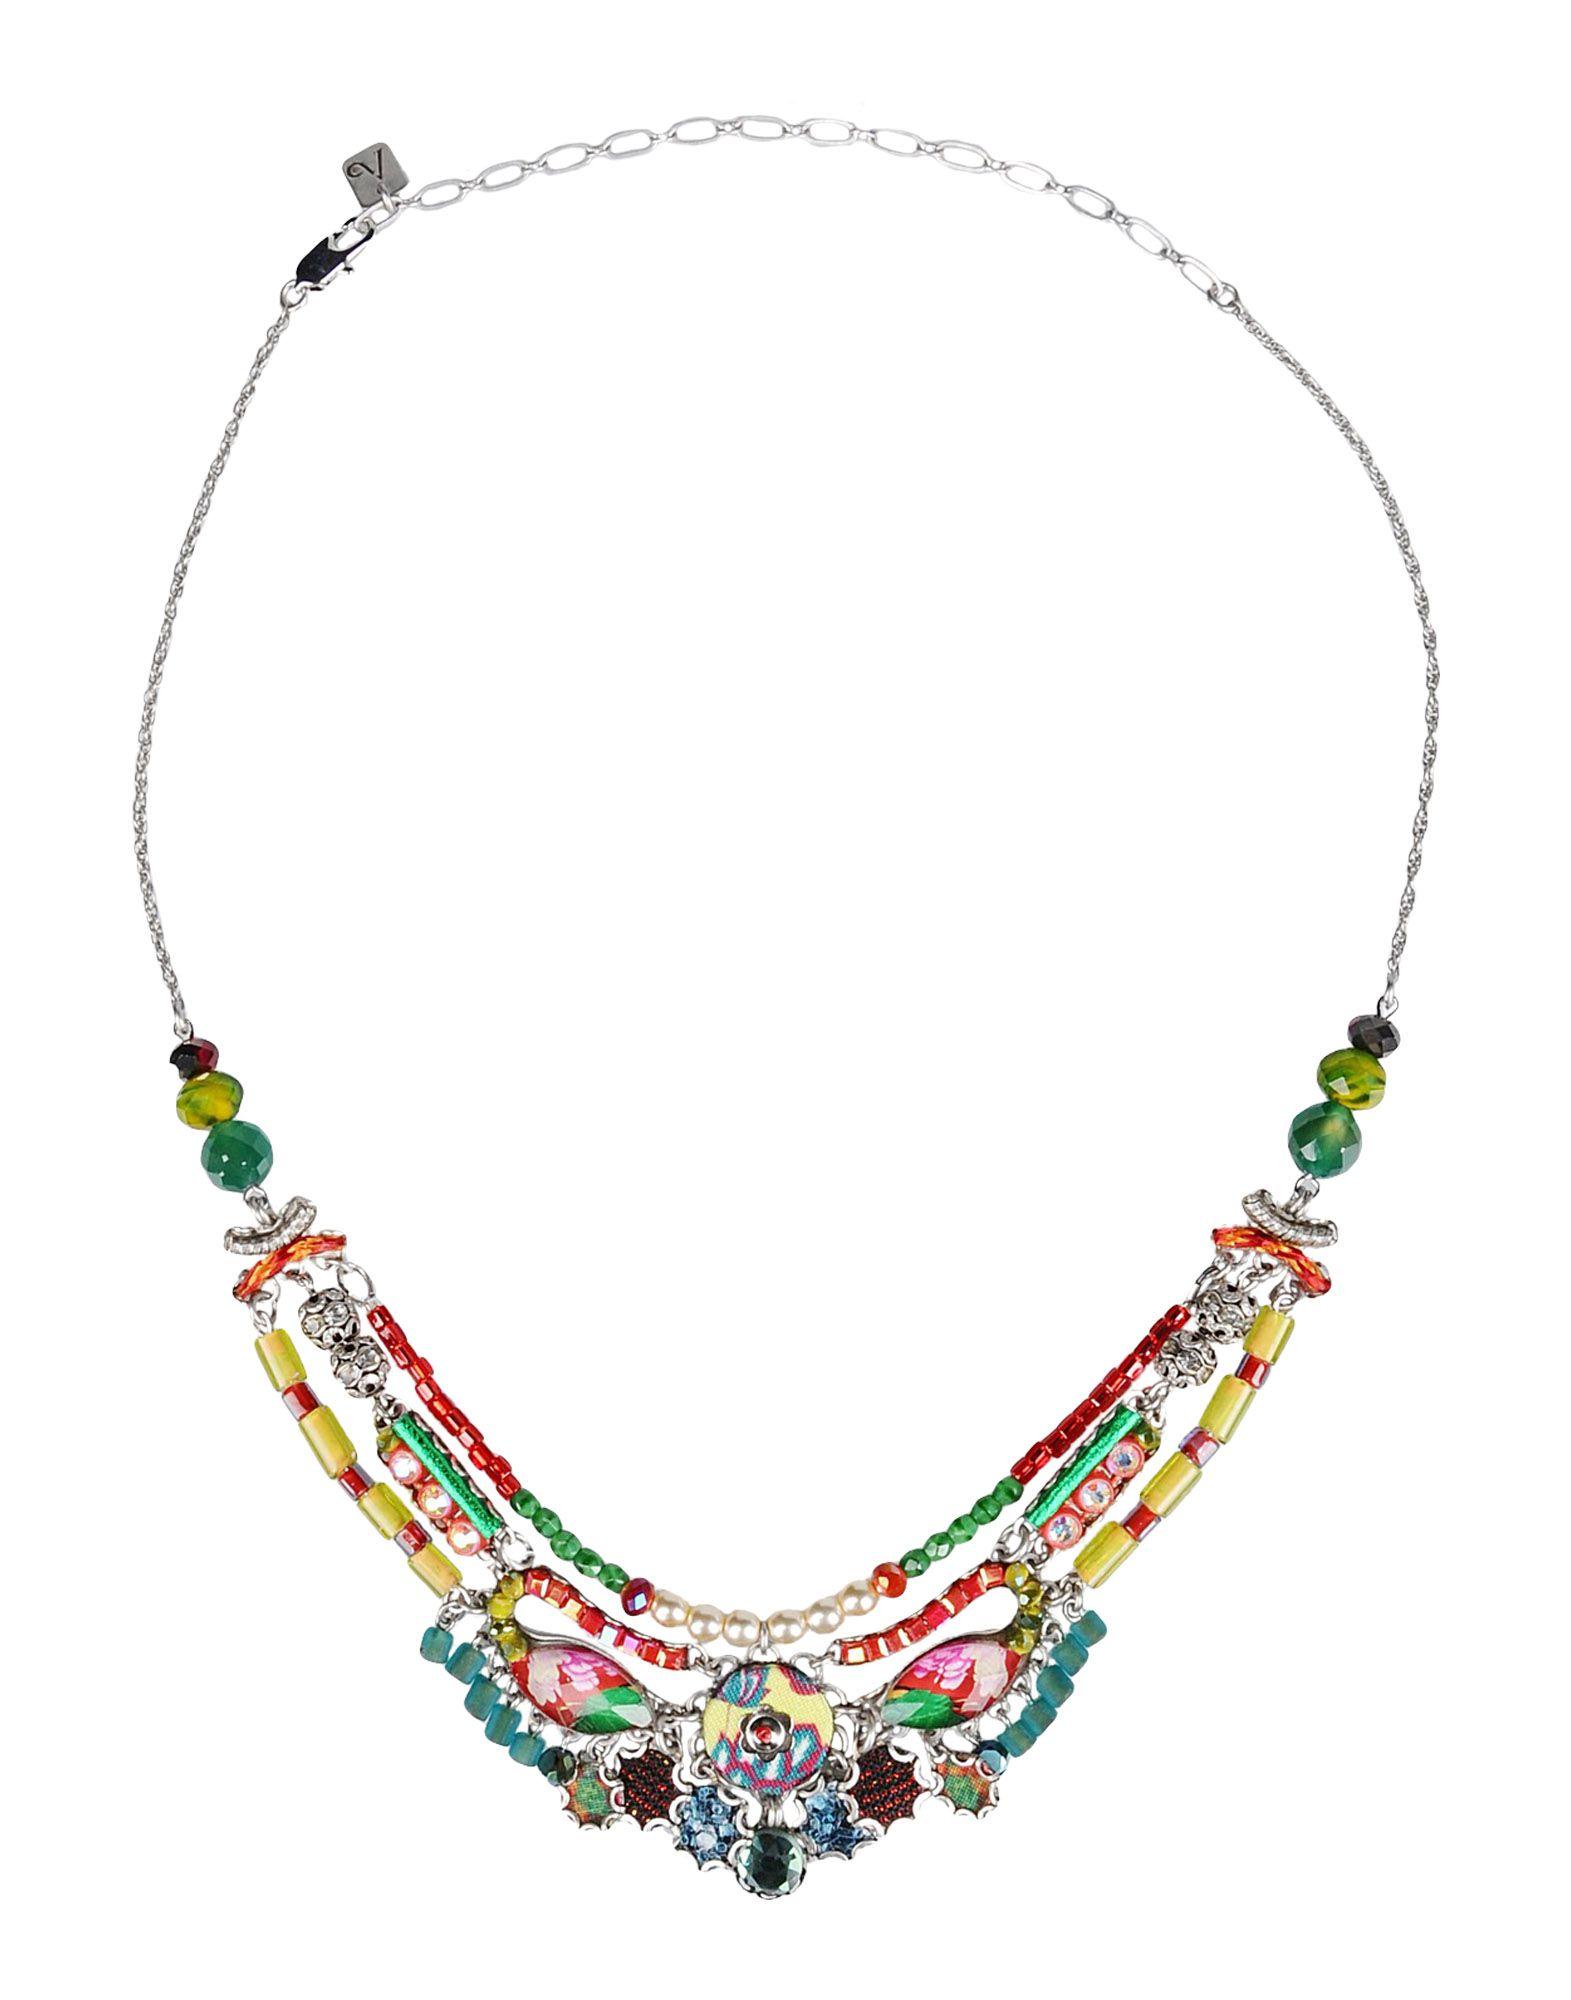 AYALA BAR Damen Halskette Farbe Grün Größe 1